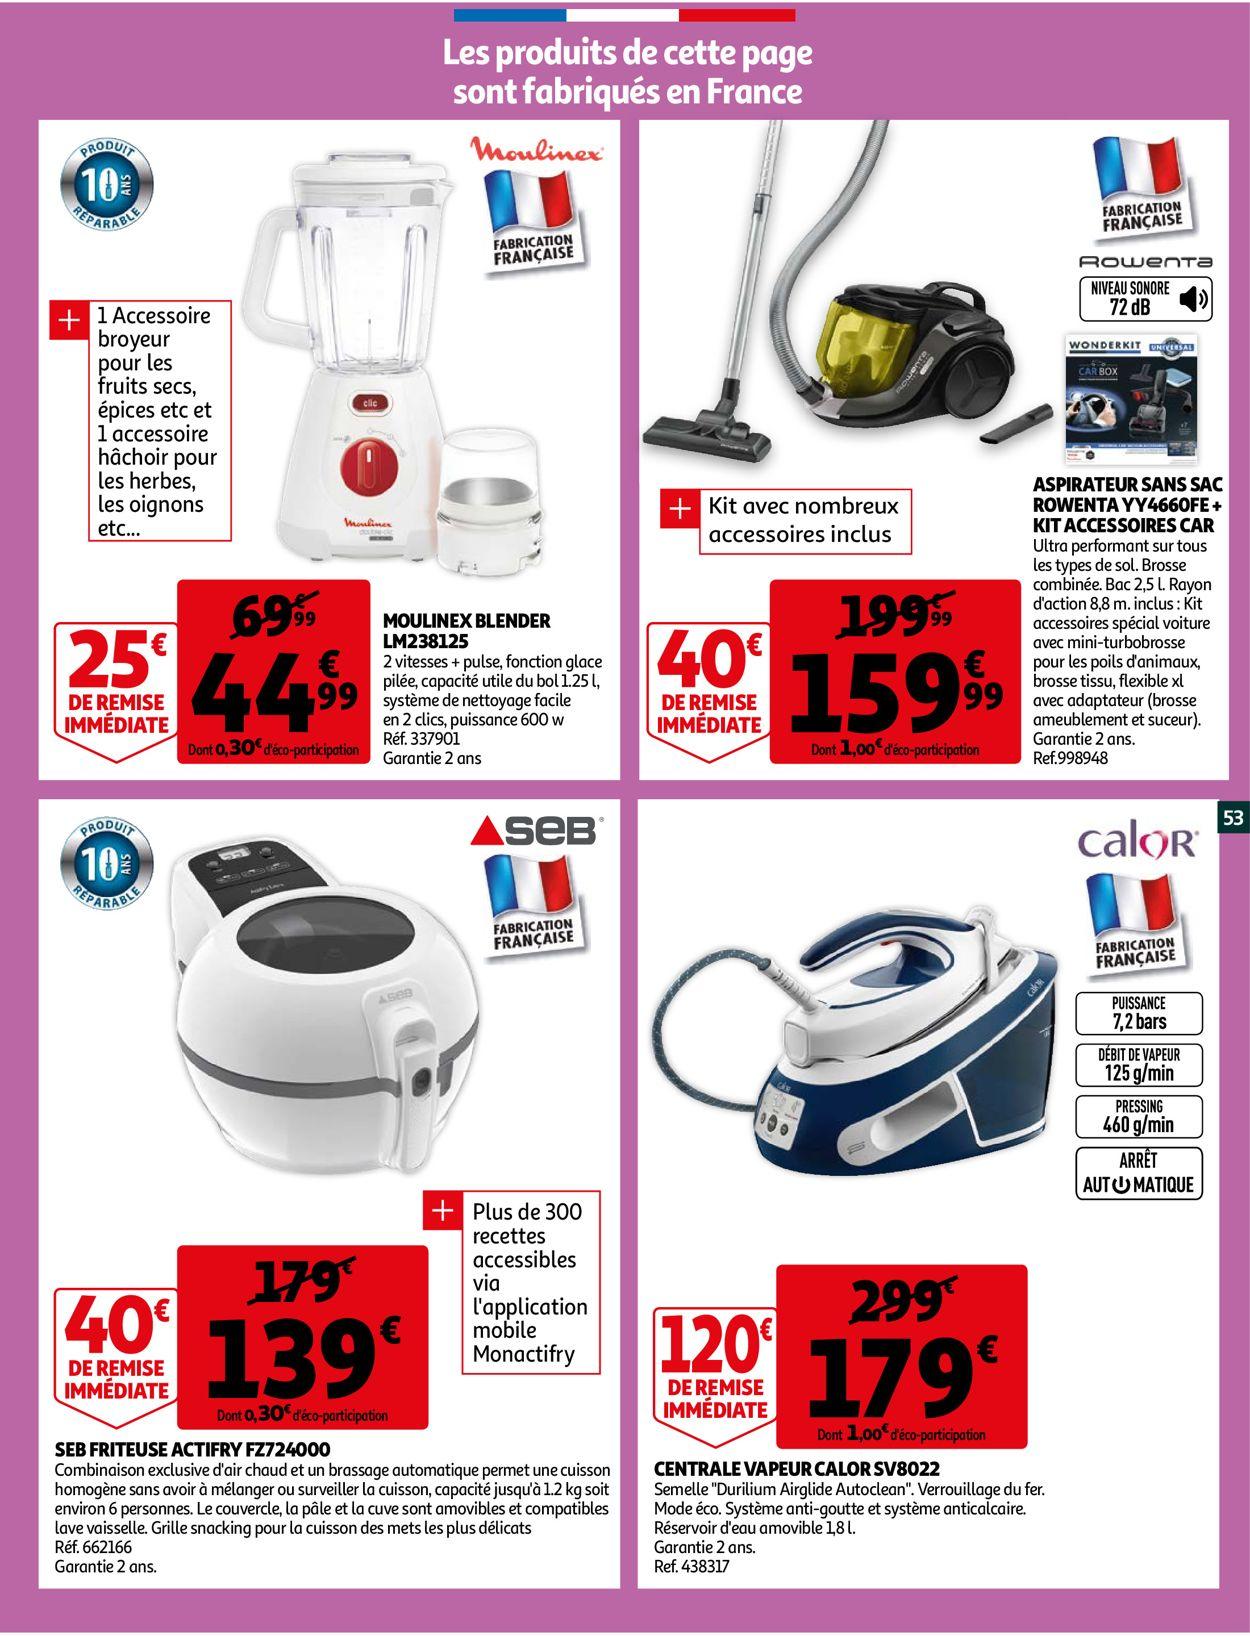 Auchan Catalogue - 05.05-11.05.2021 (Page 53)